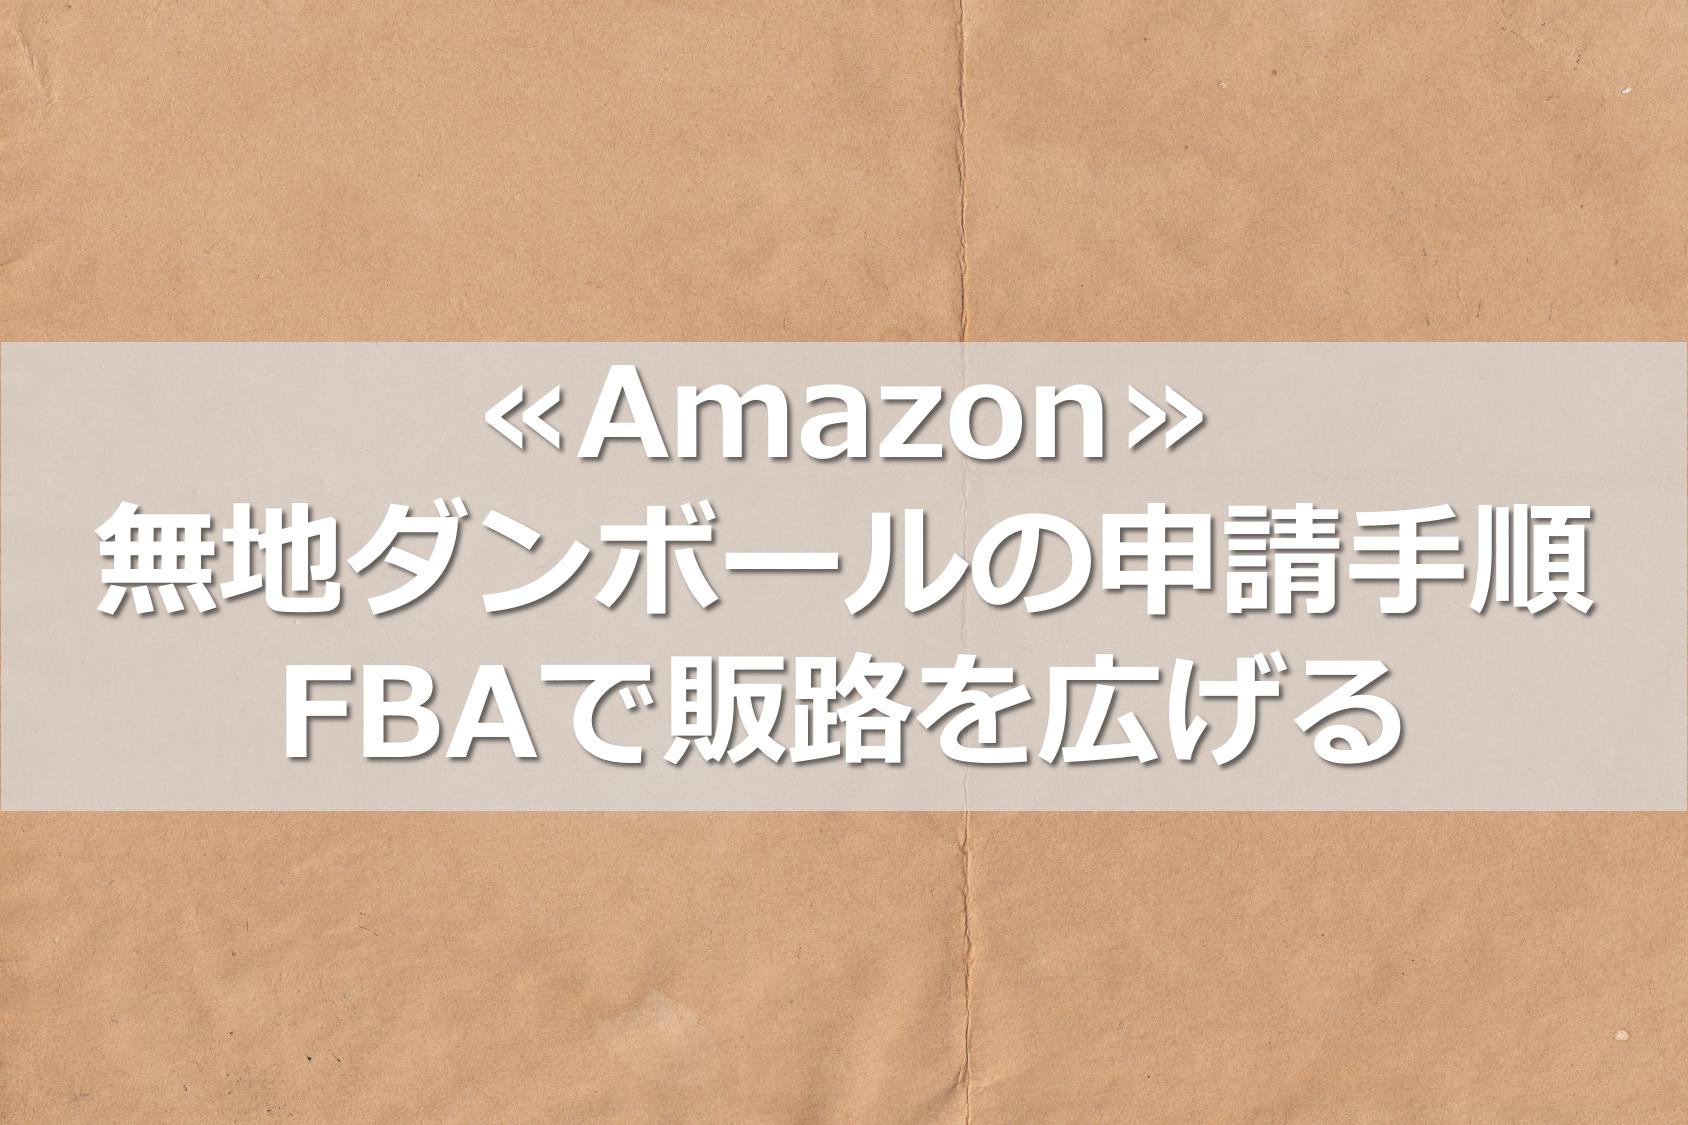 amazon-plain-cardboard